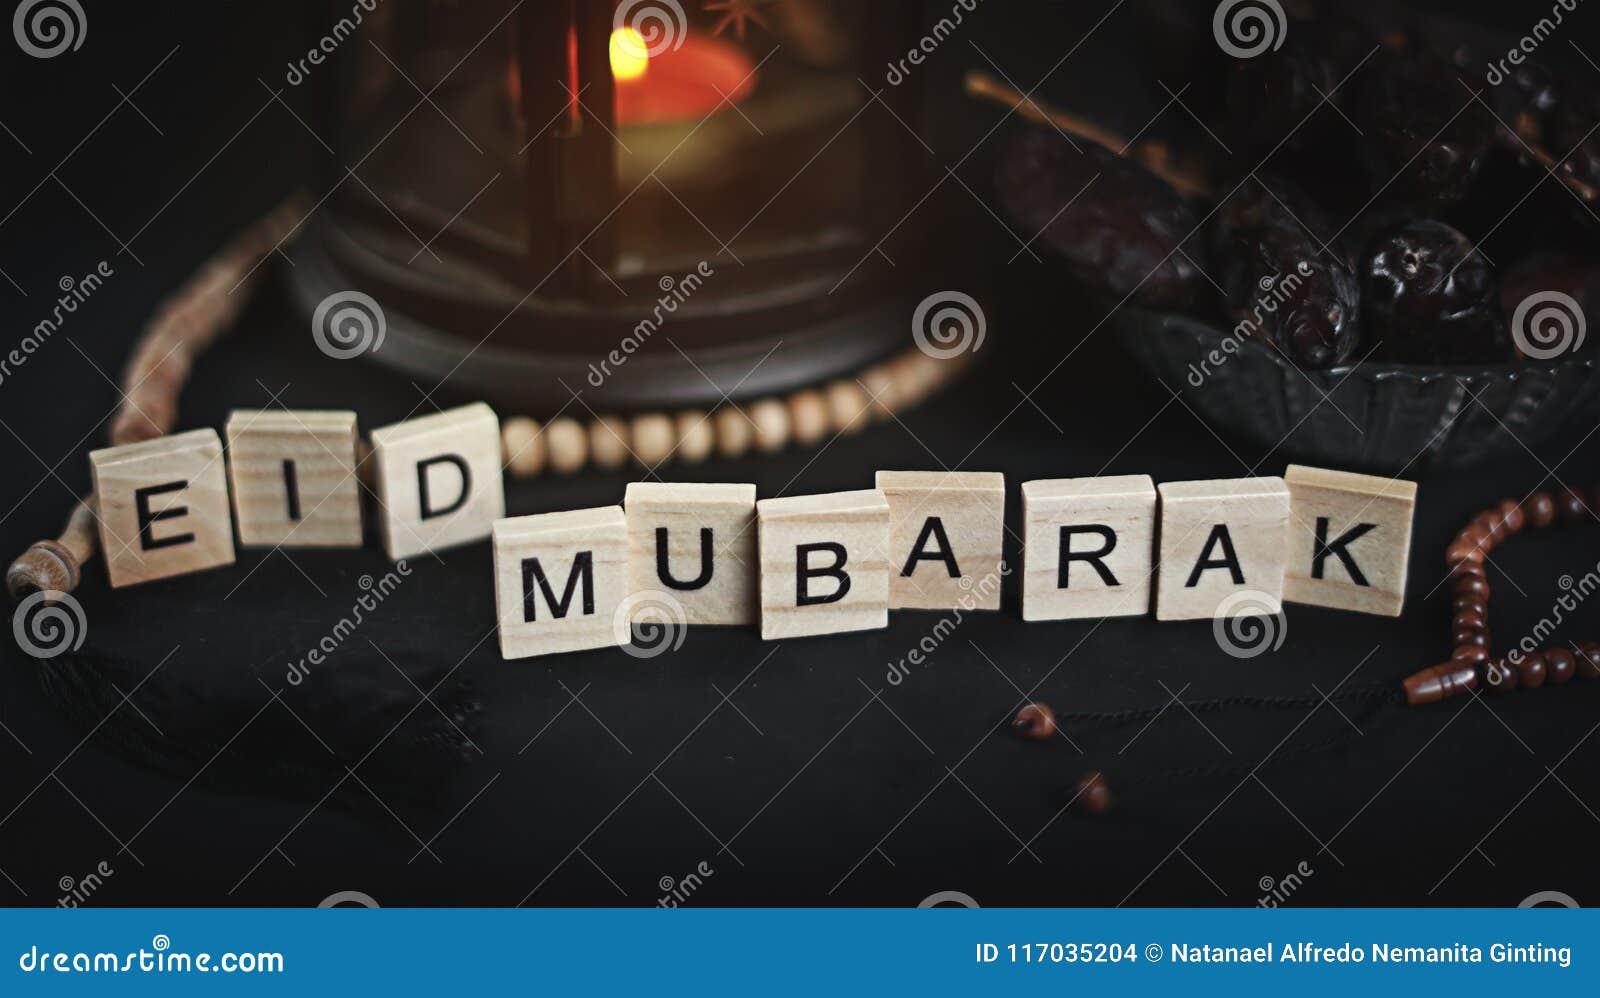 Eid Mubarak Greeting Scrabble Letters Ramadan Candle Lantern Wi